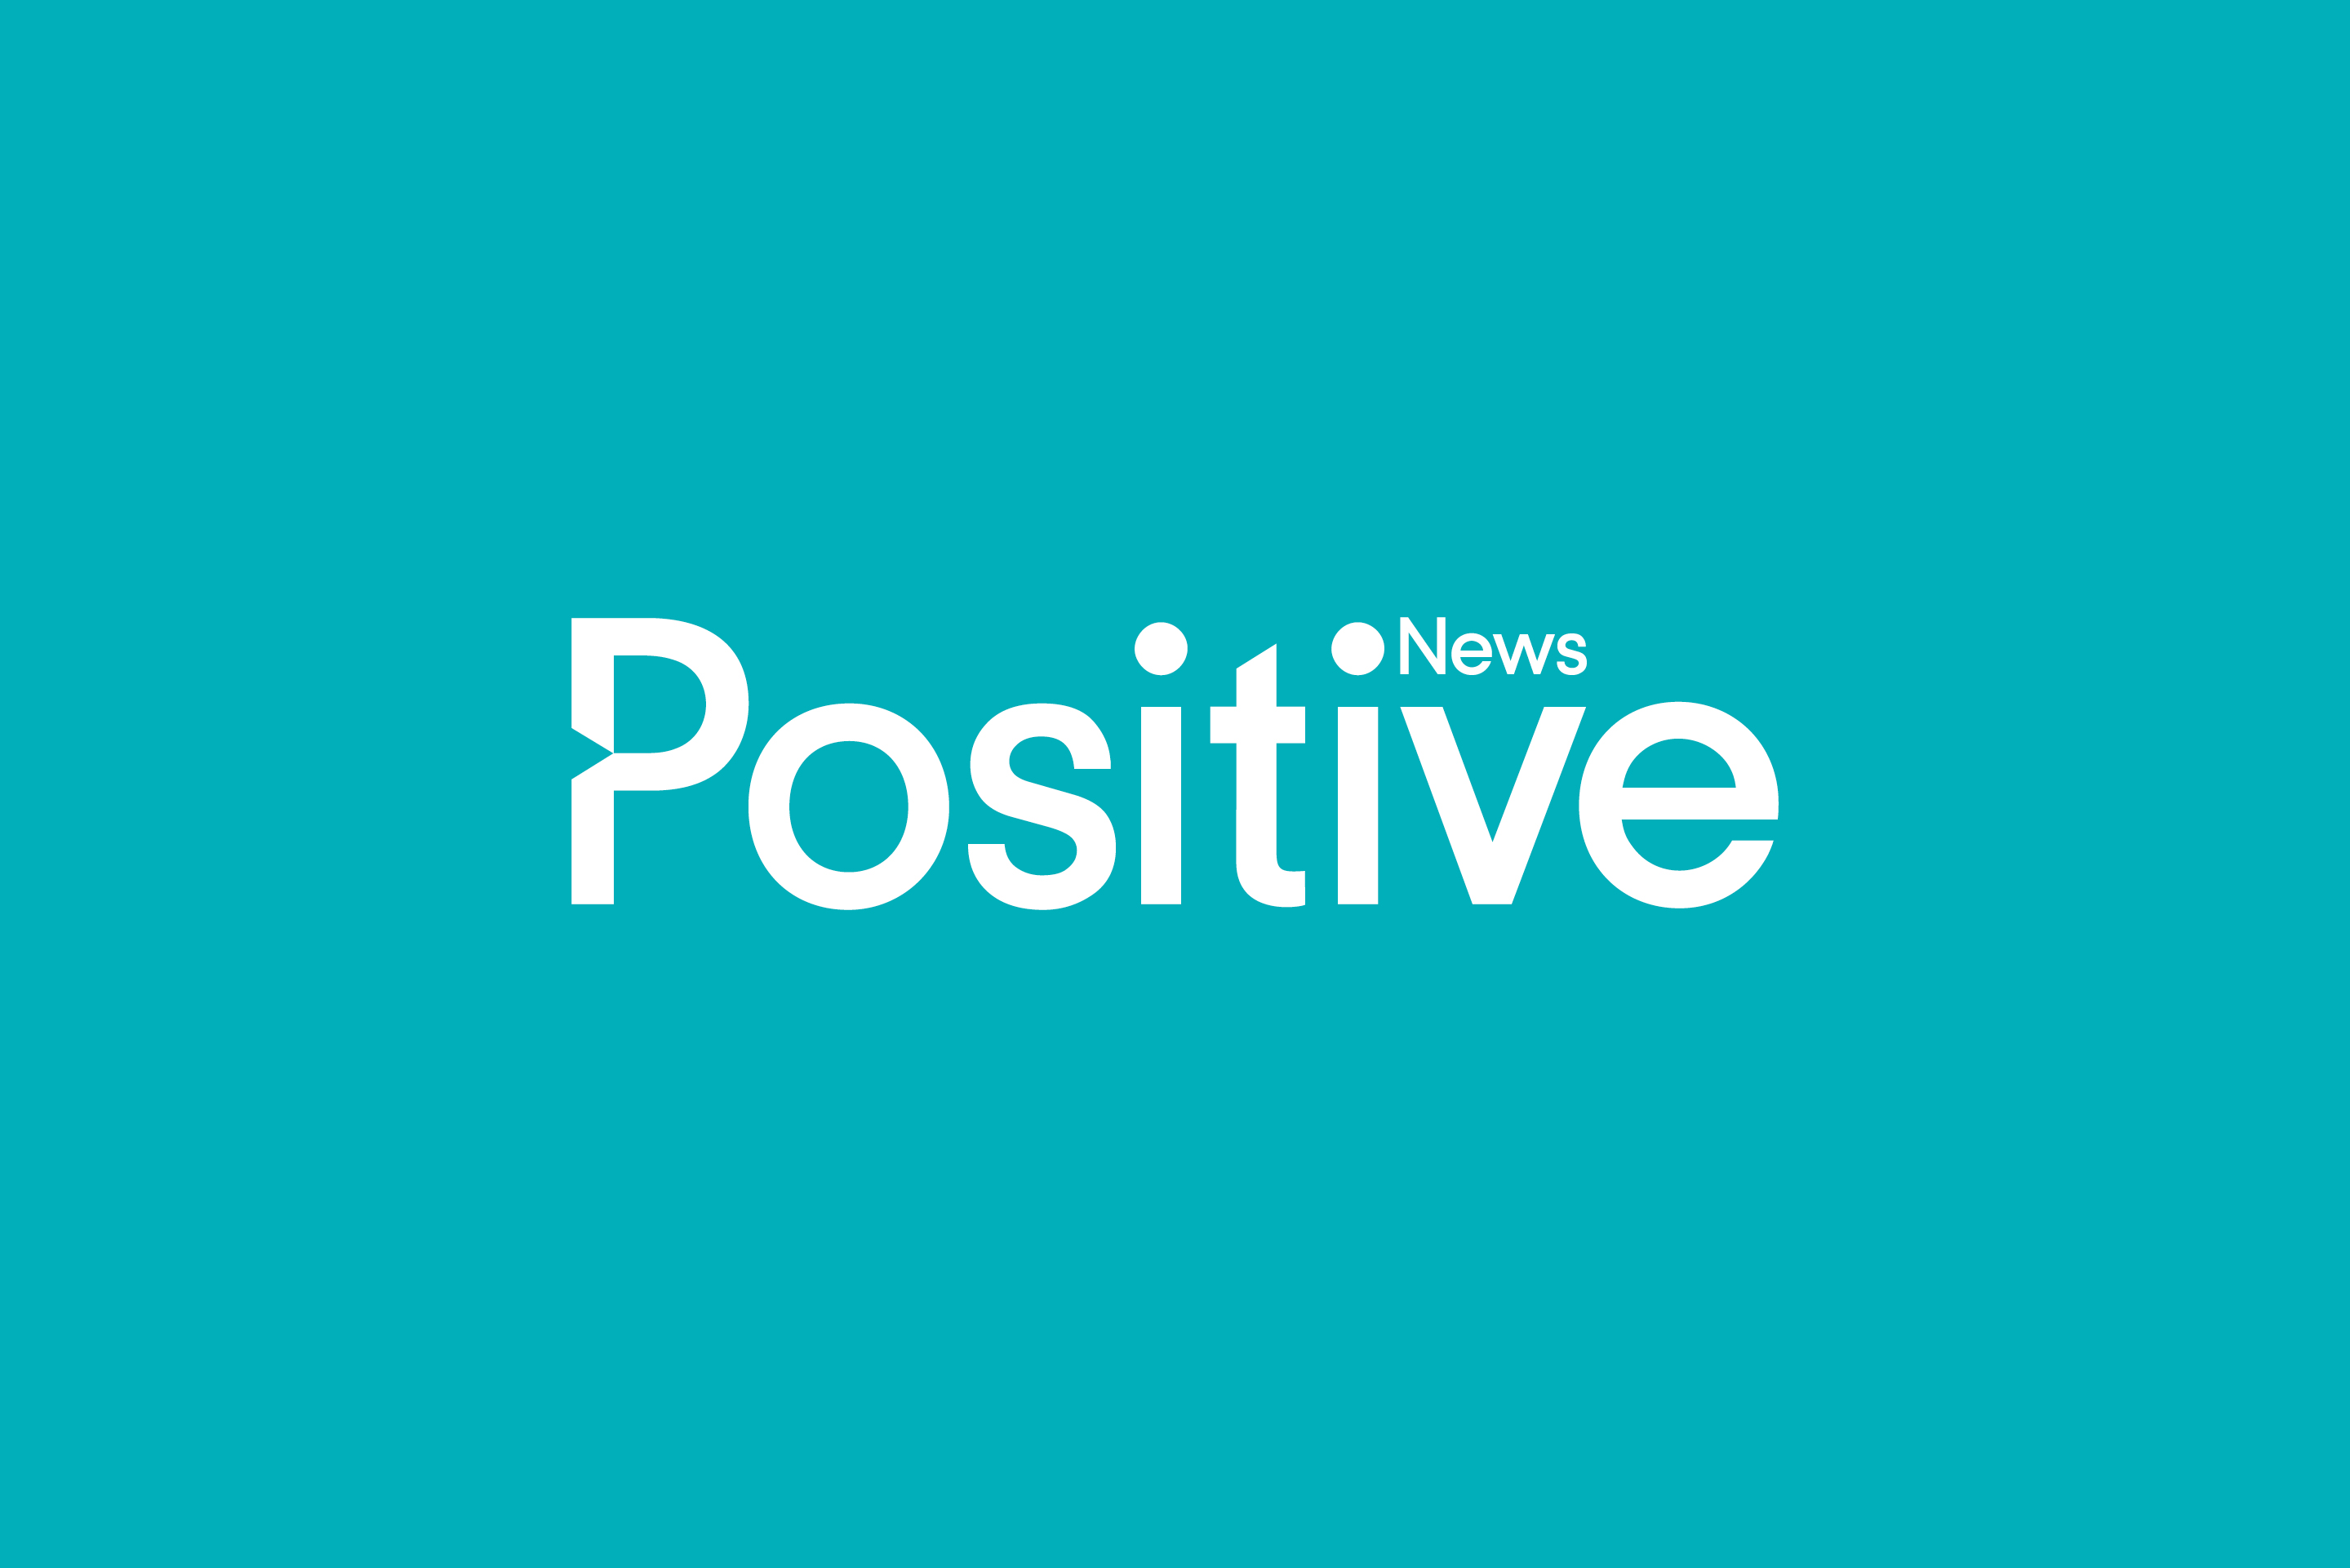 Positive_News_06